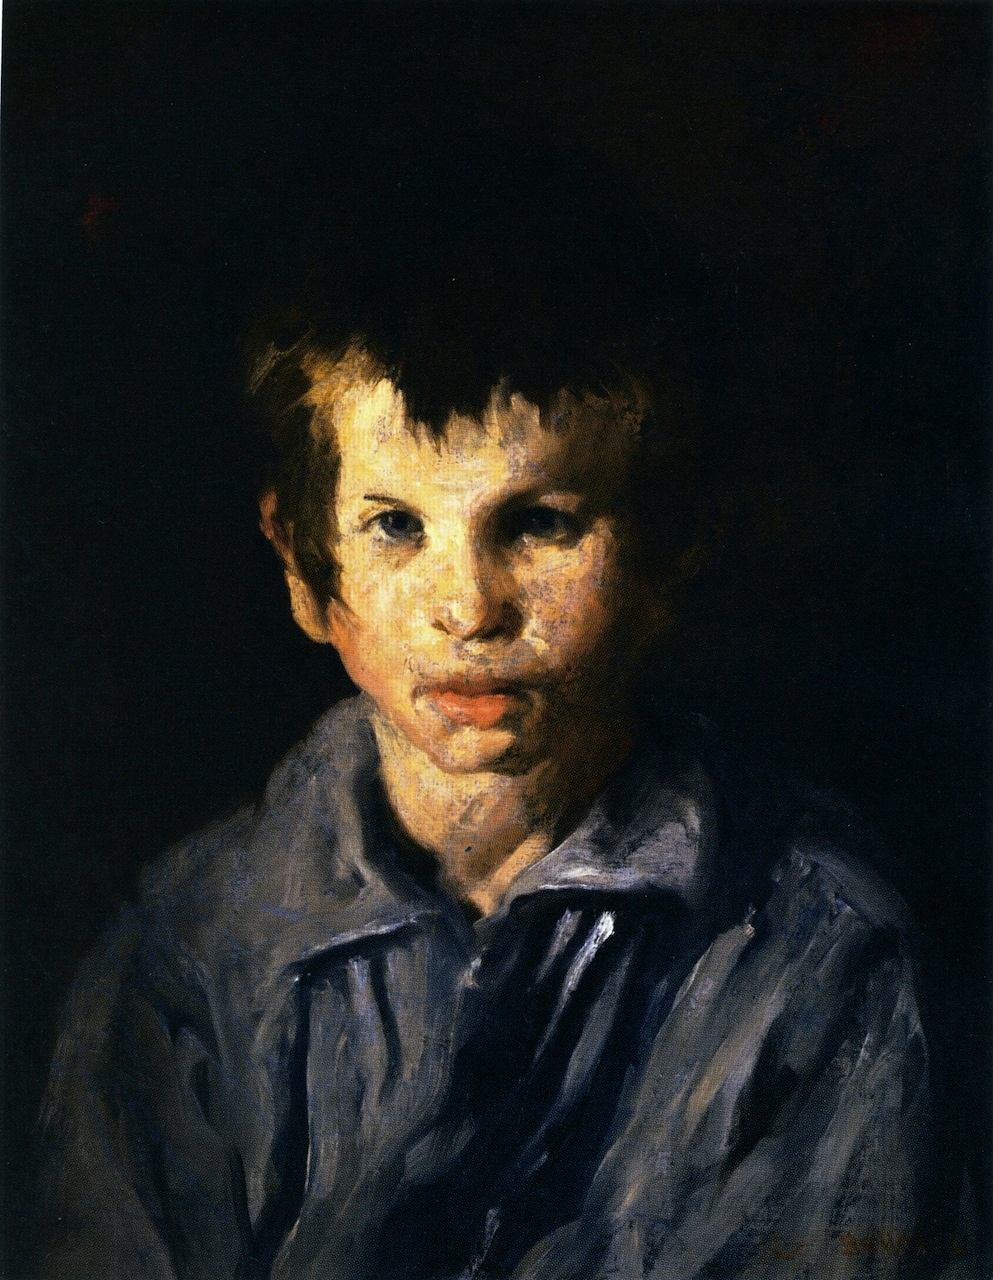 George_Bellows_-_Cross-Eyed_Boy_(1906)